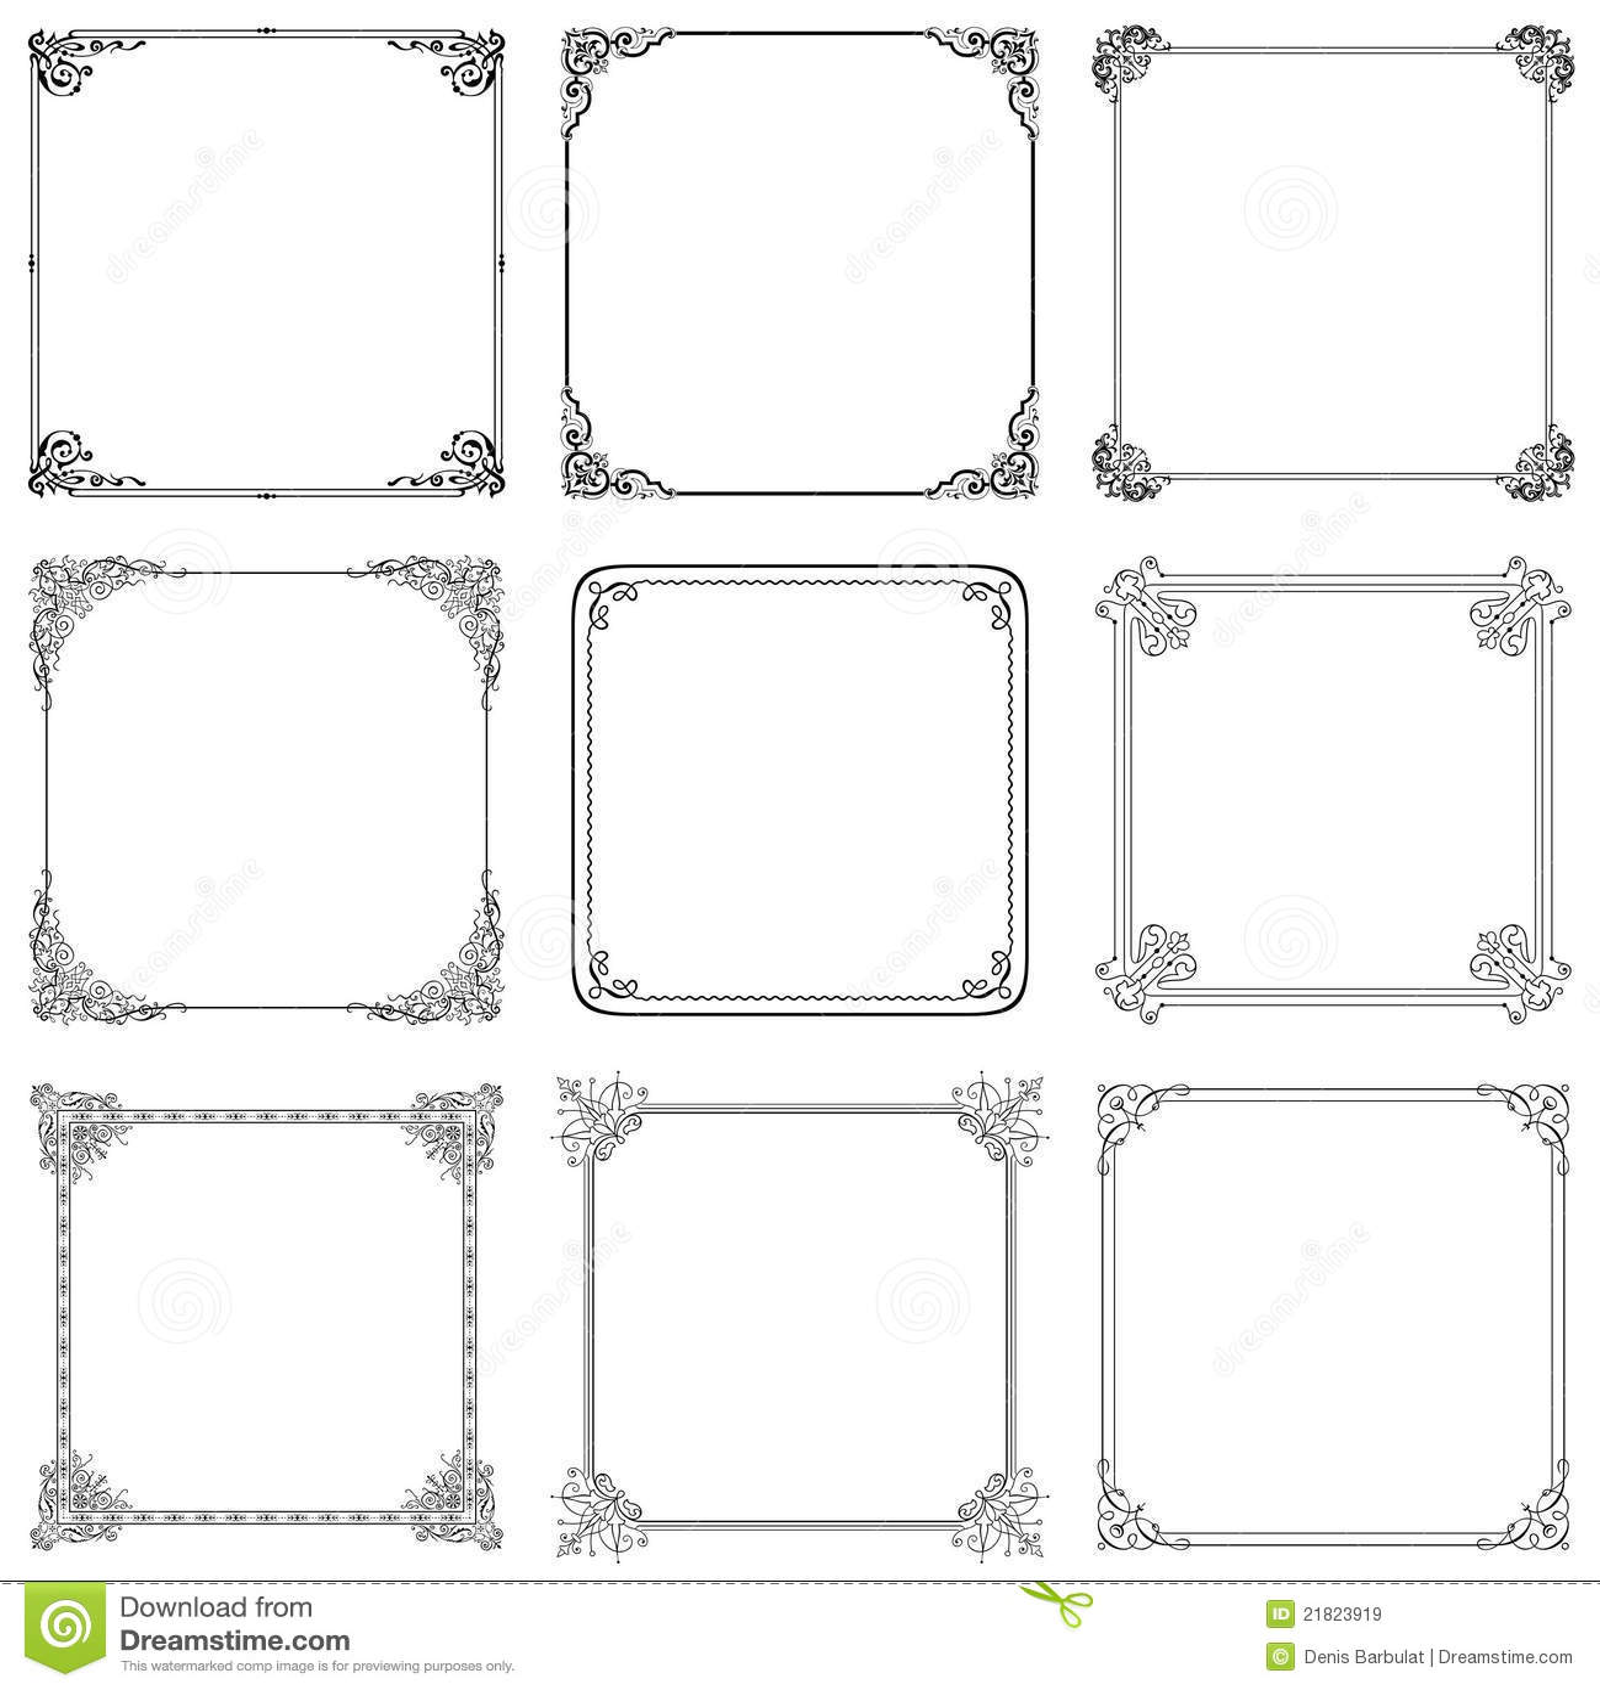 Elegant vector frame stock vector. Illustration of element - 21823919